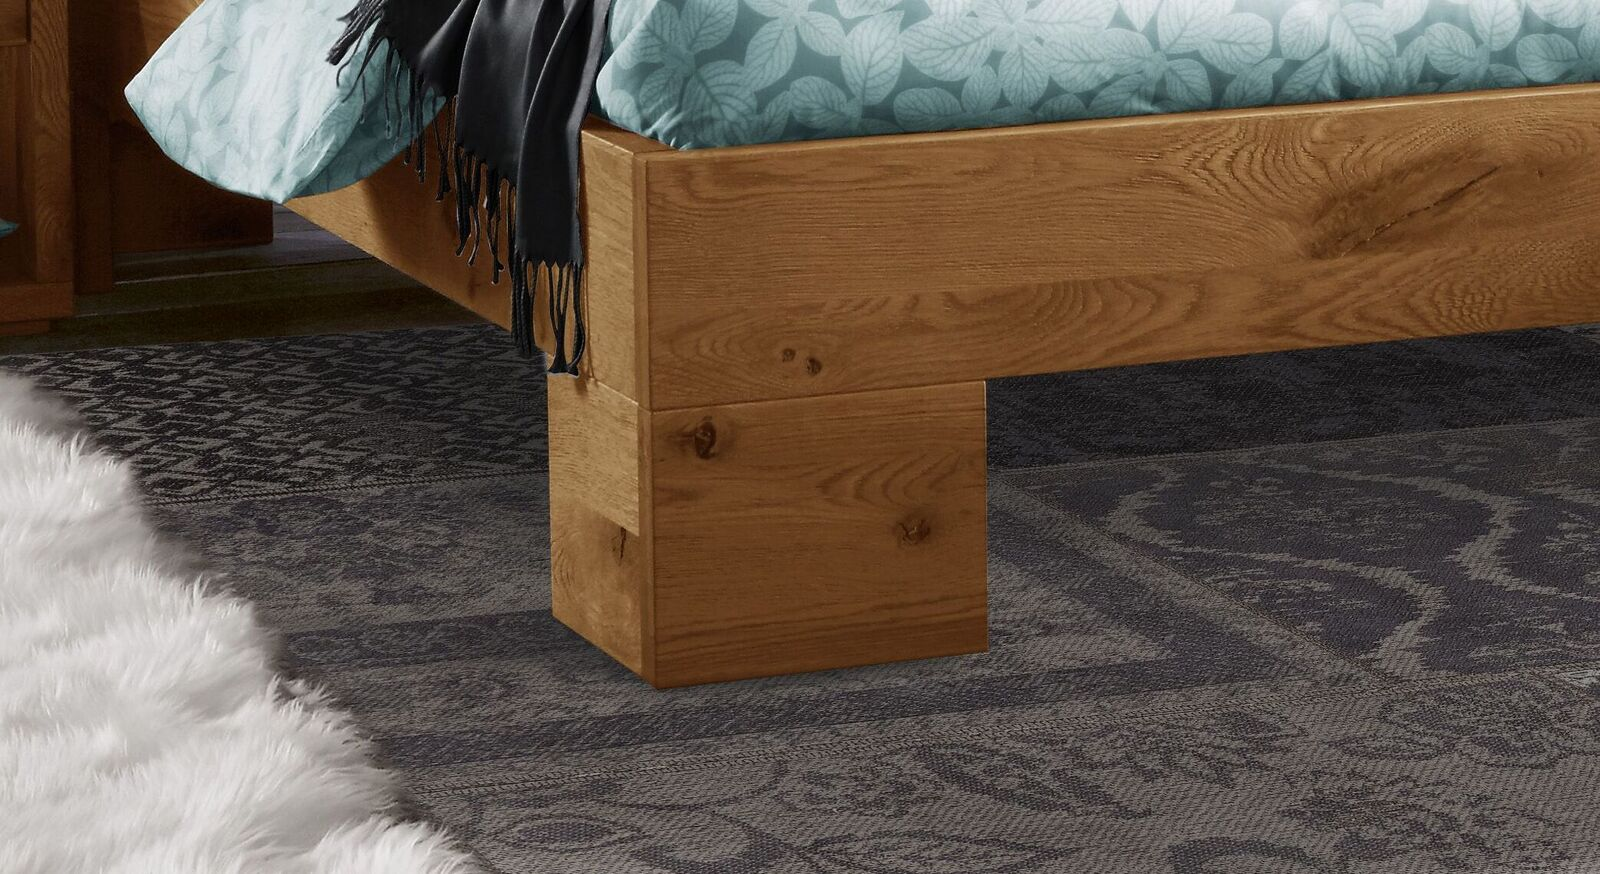 Bett Titao mit attraktiven Winkelfüßen